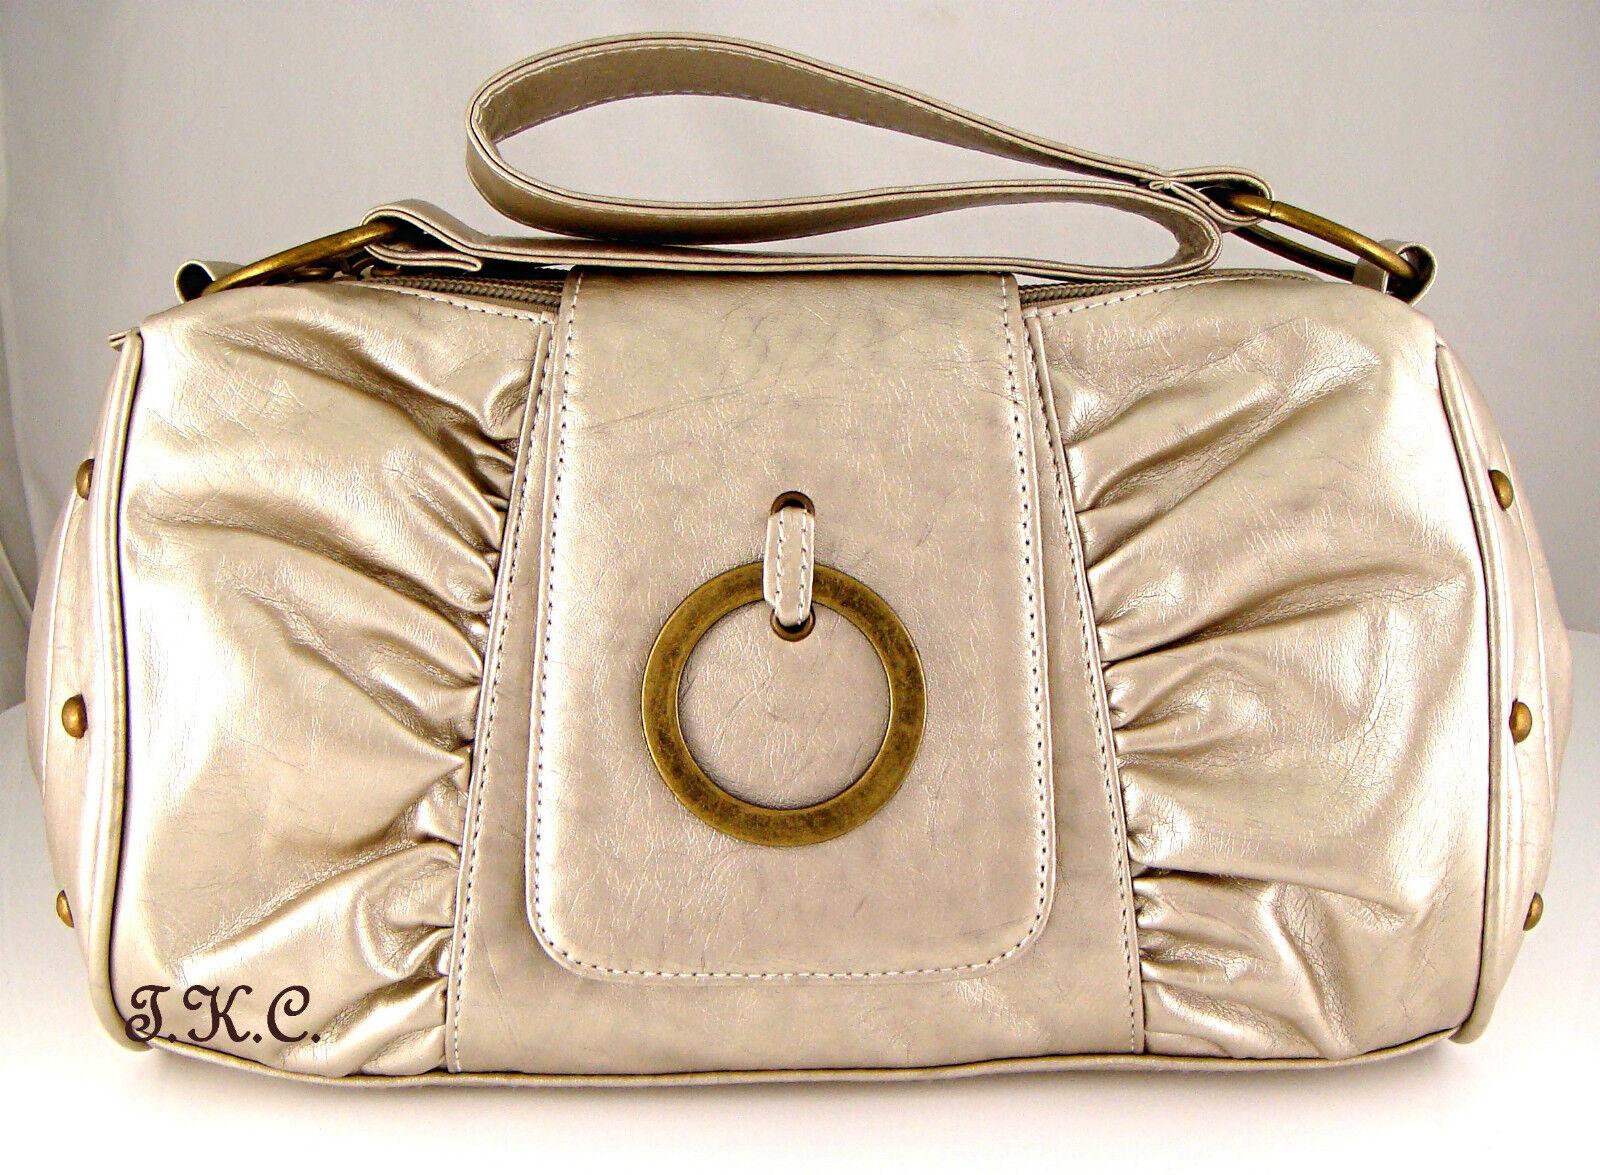 Ruched Soft Metallic Brown Oyster Gold Vegan Leather Compartment Shoulder Bag